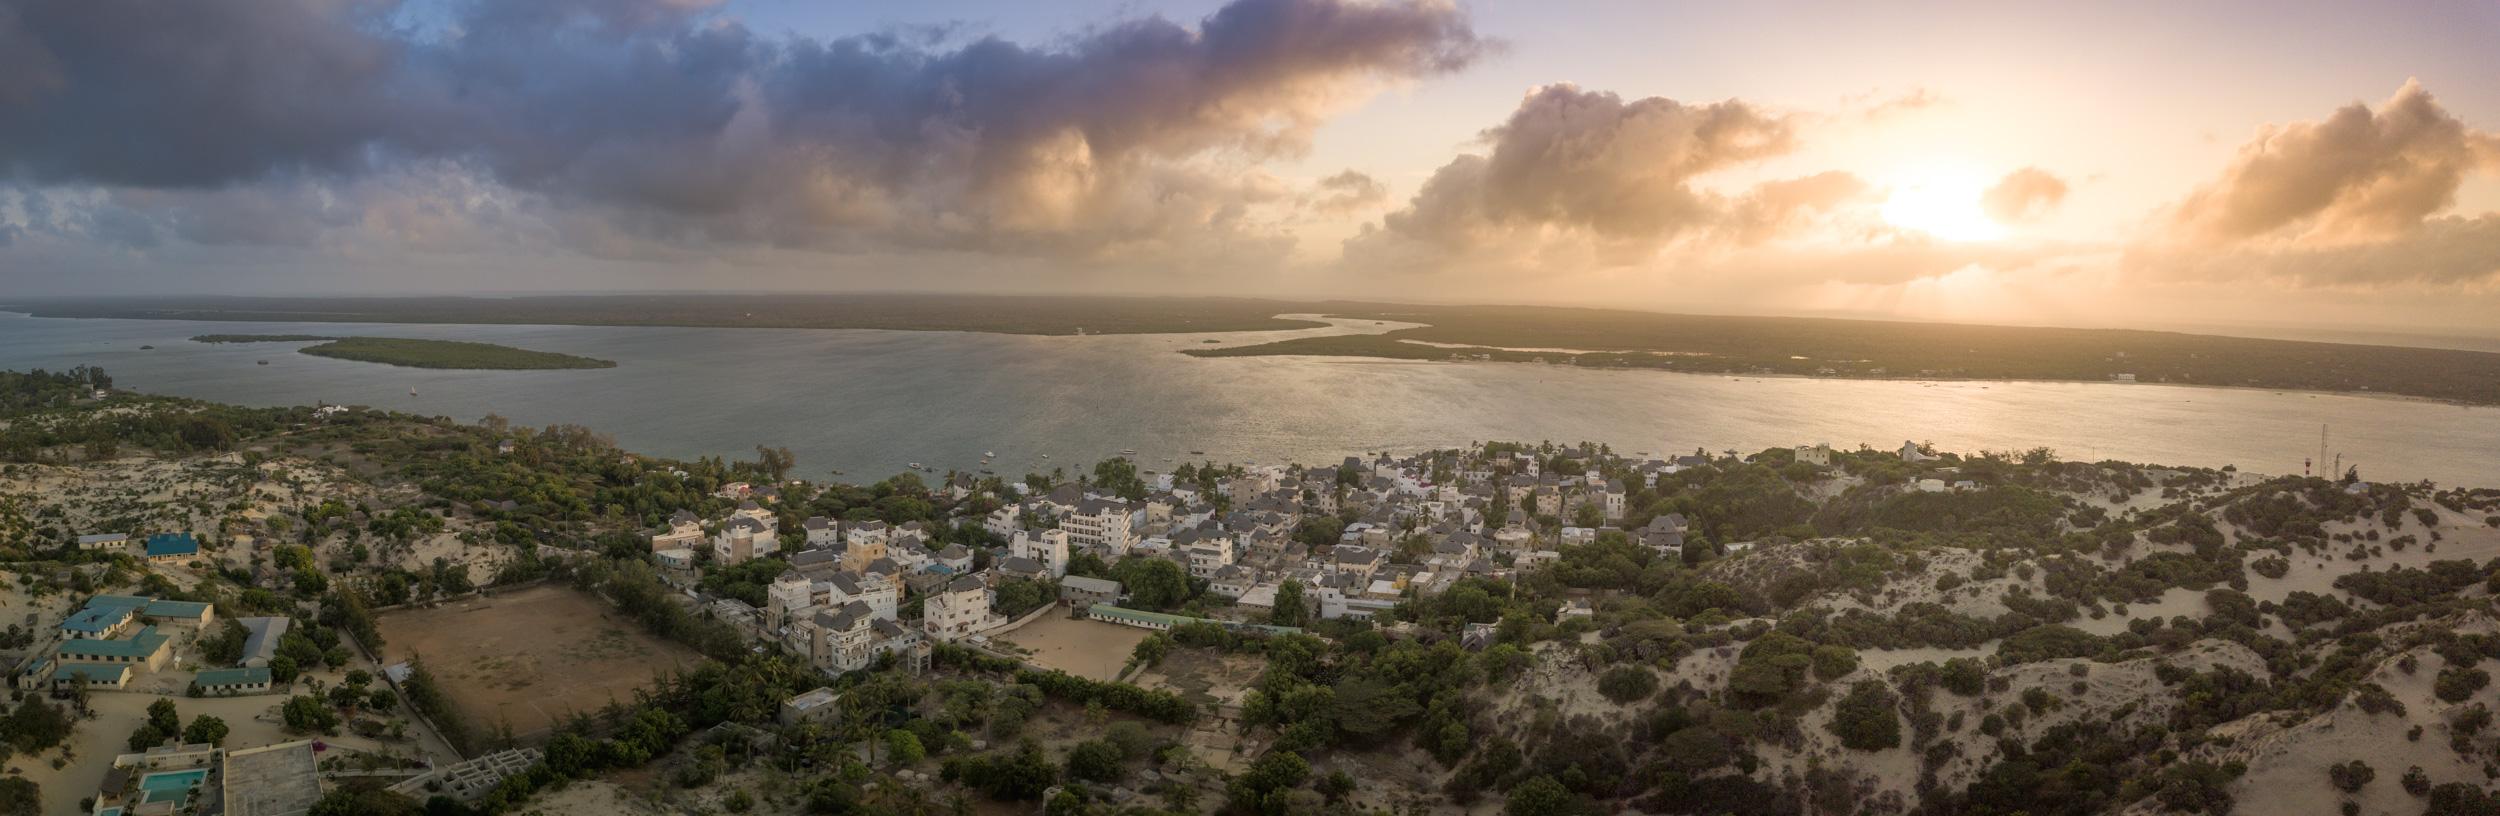 sunrise above shela town, lamu island, kenya